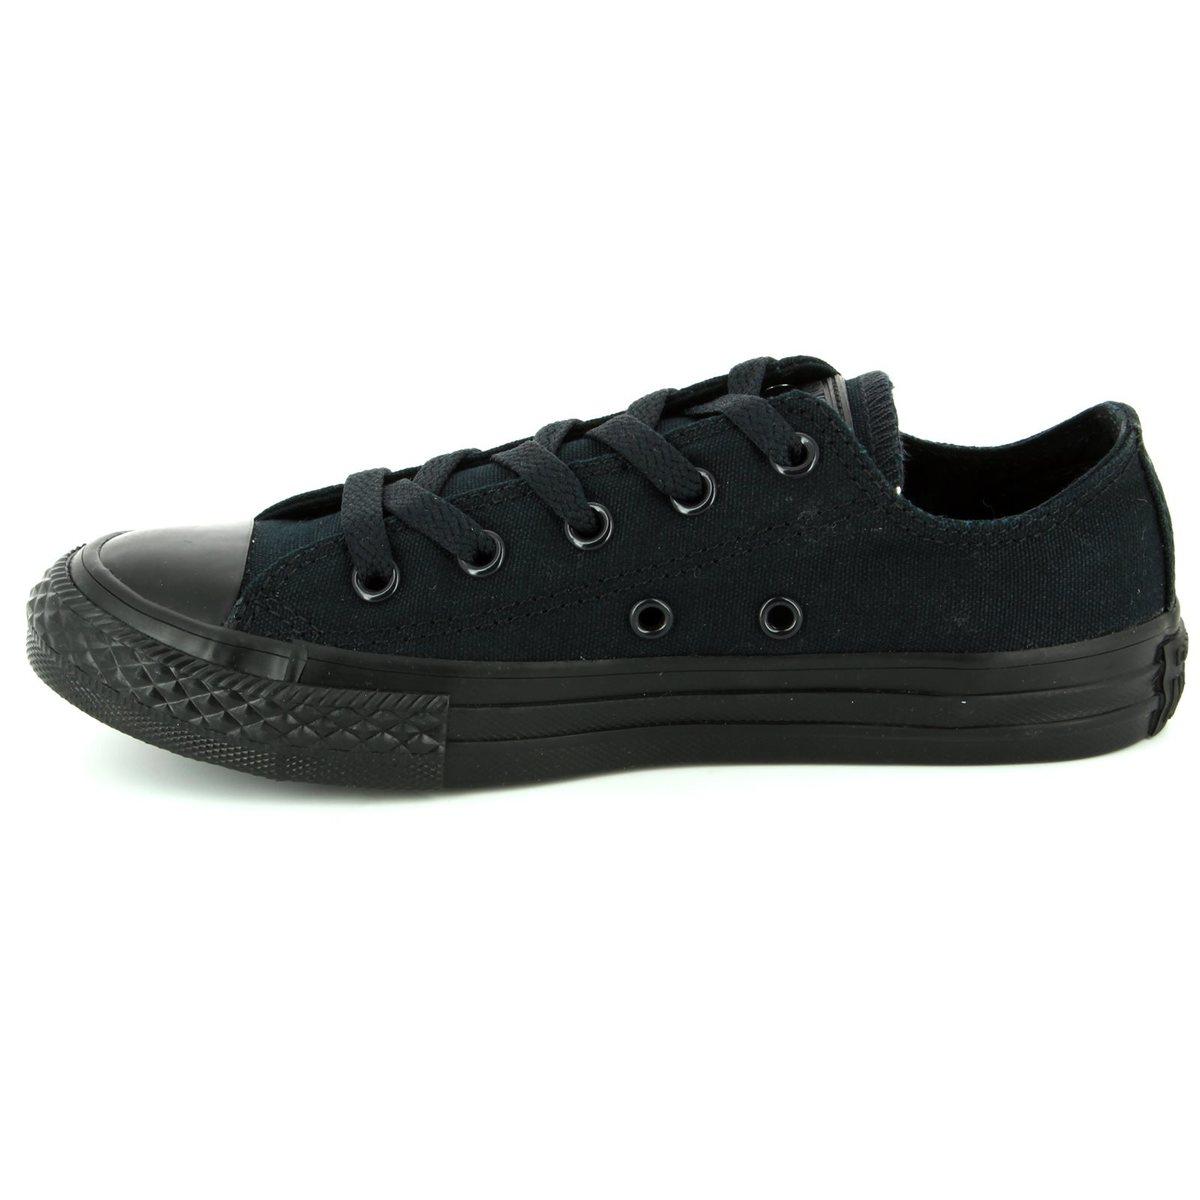 5302cf3087 Converse Trainers - Black - 314786C All Star Ox Black Monochrome